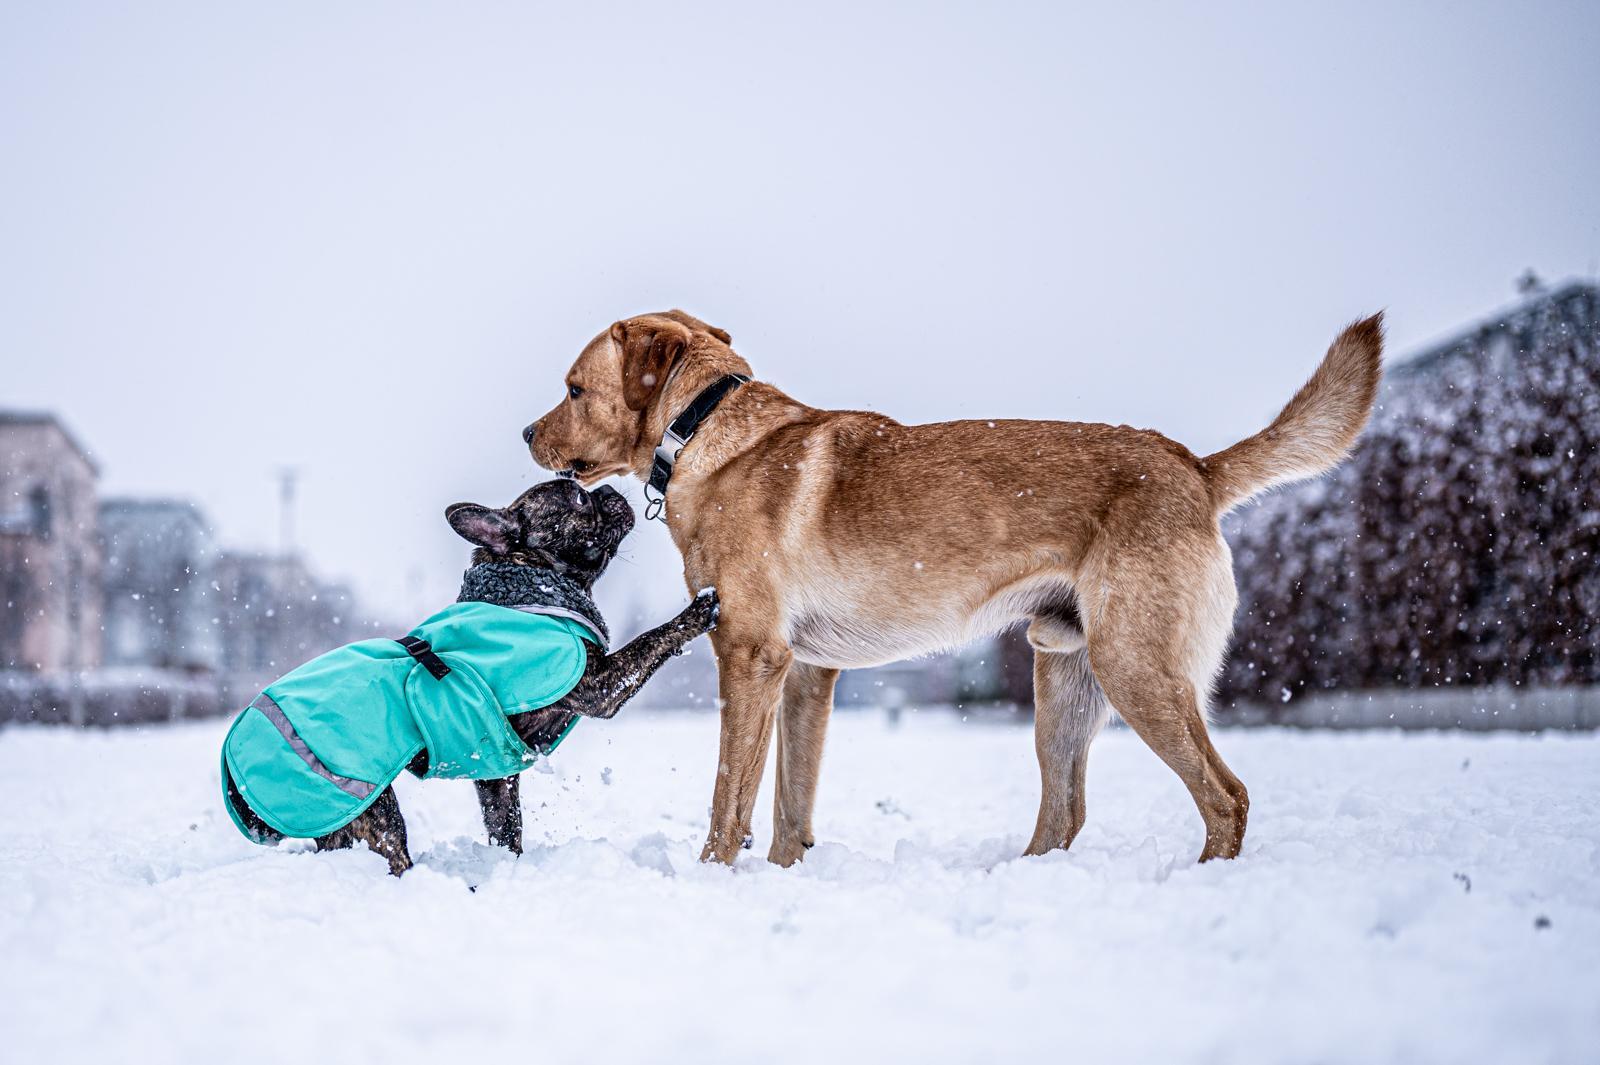 Tierfotograf-Labrador-Sven's Bildwerke-Hund-Hundefotografie21